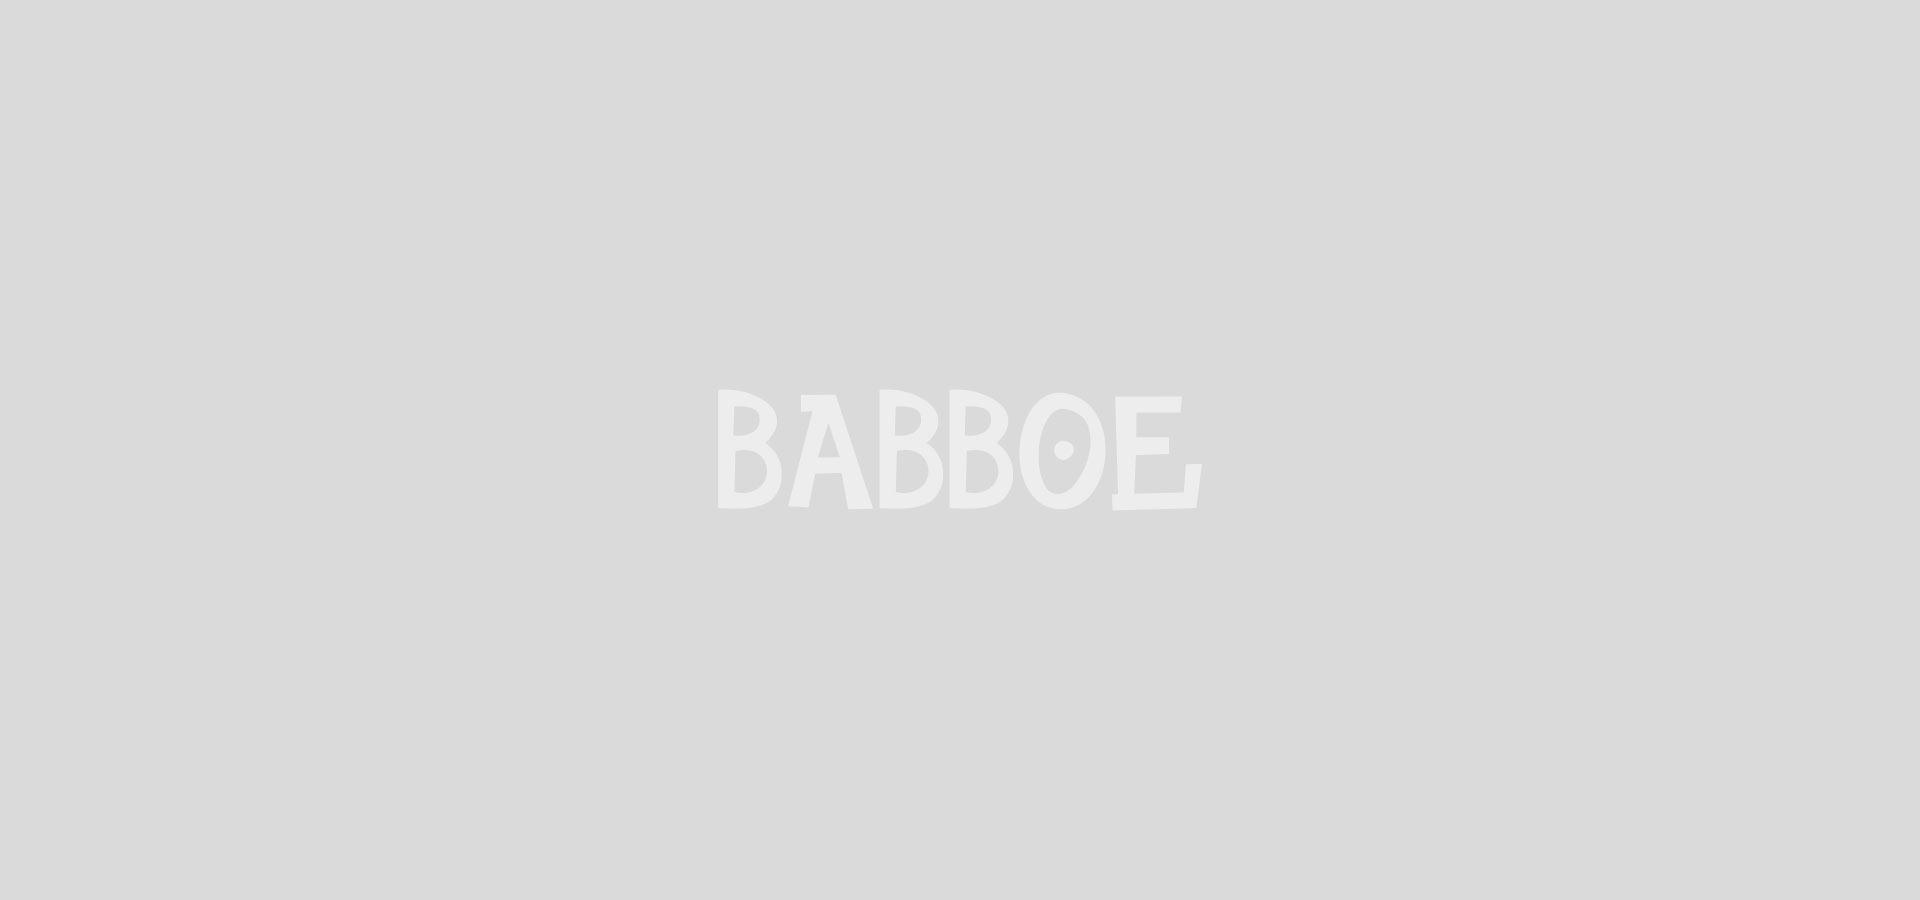 Babboe Carve